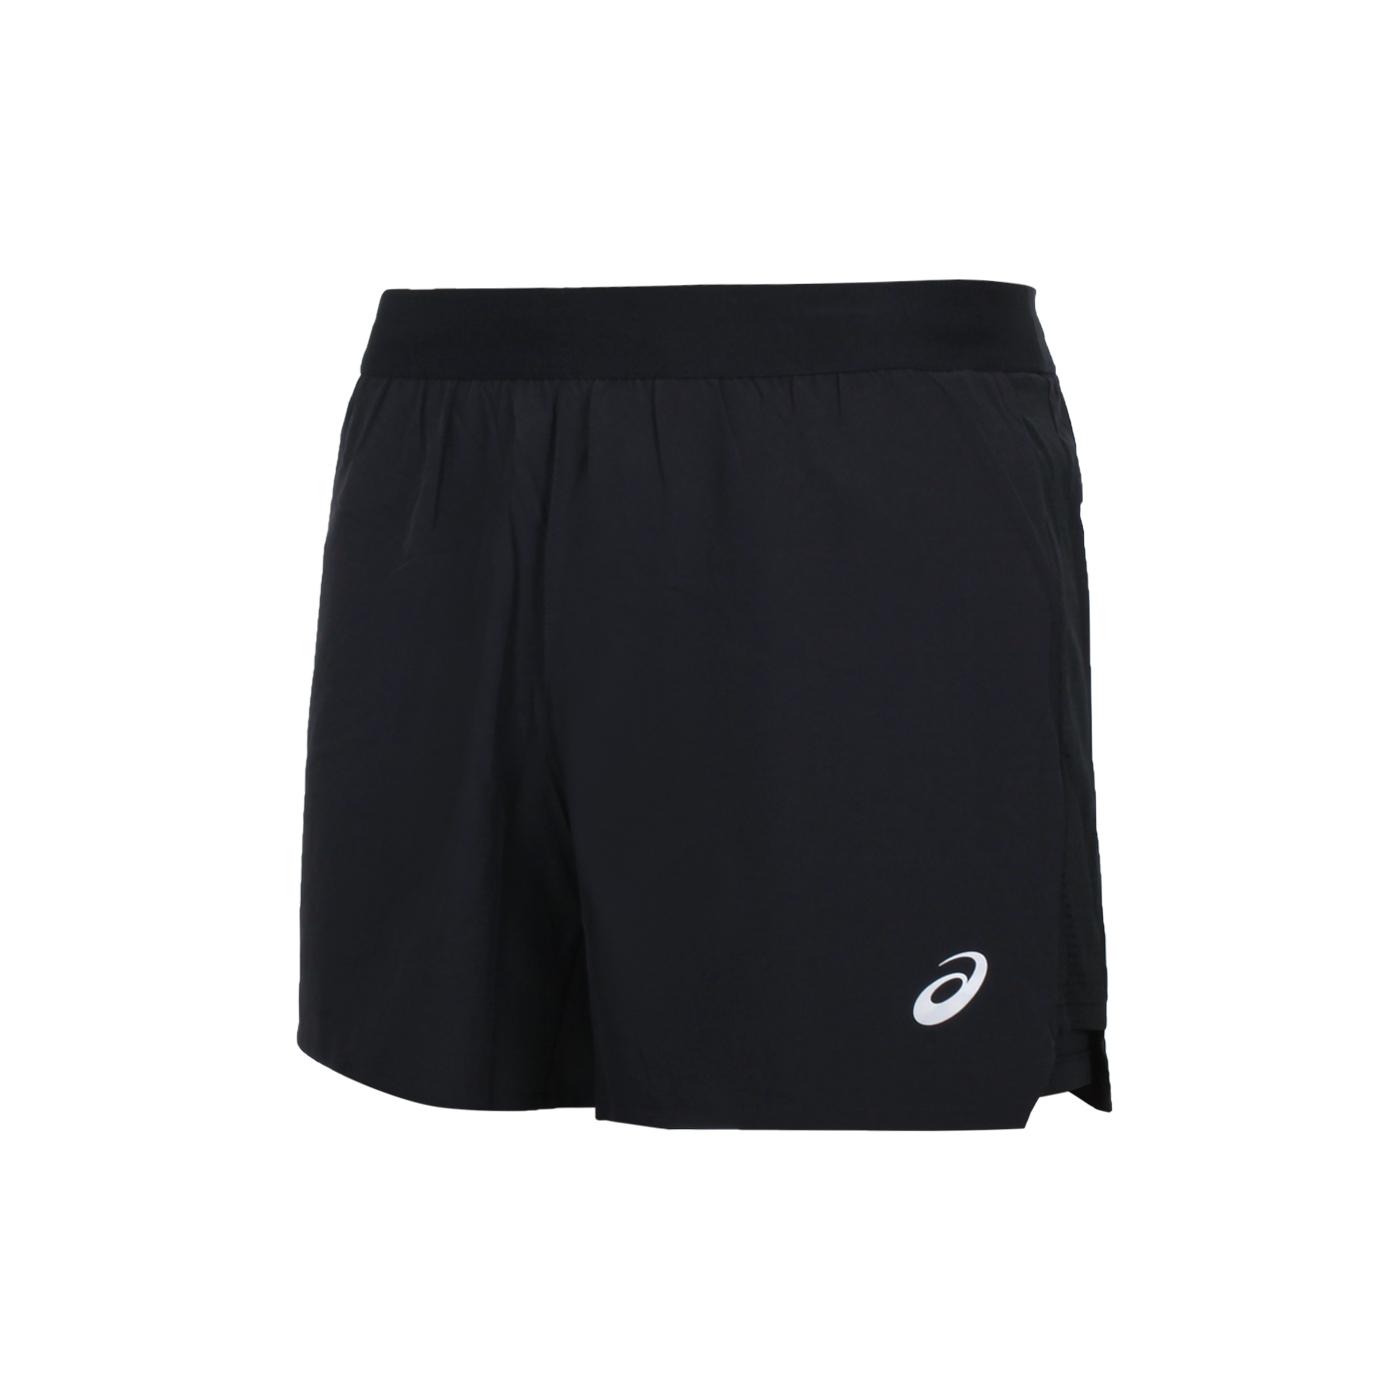 ASICS 男款平織短褲 2011A838-001